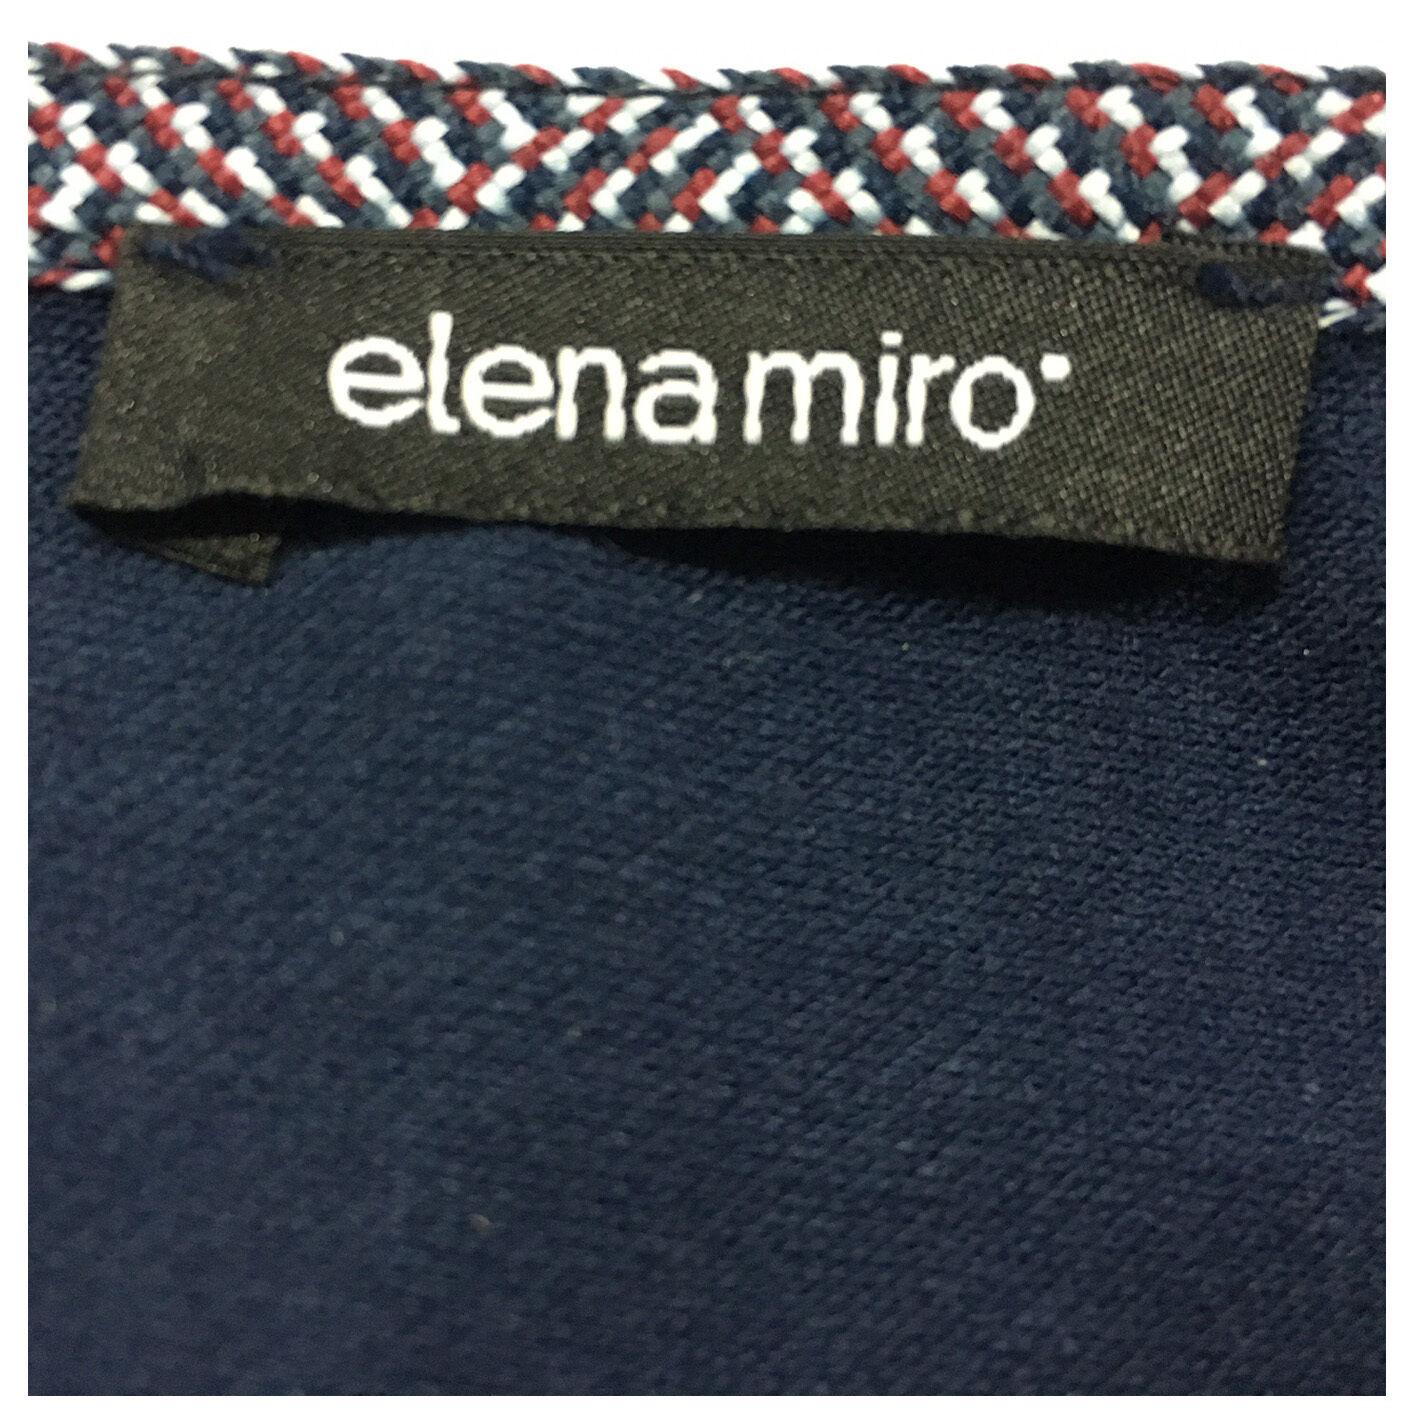 ELENA MIRÒ Polo Damen blau klar mit Kontrast Kontrast Kontrast weiß 97% Baumwolle 3% Elasthan 62232e